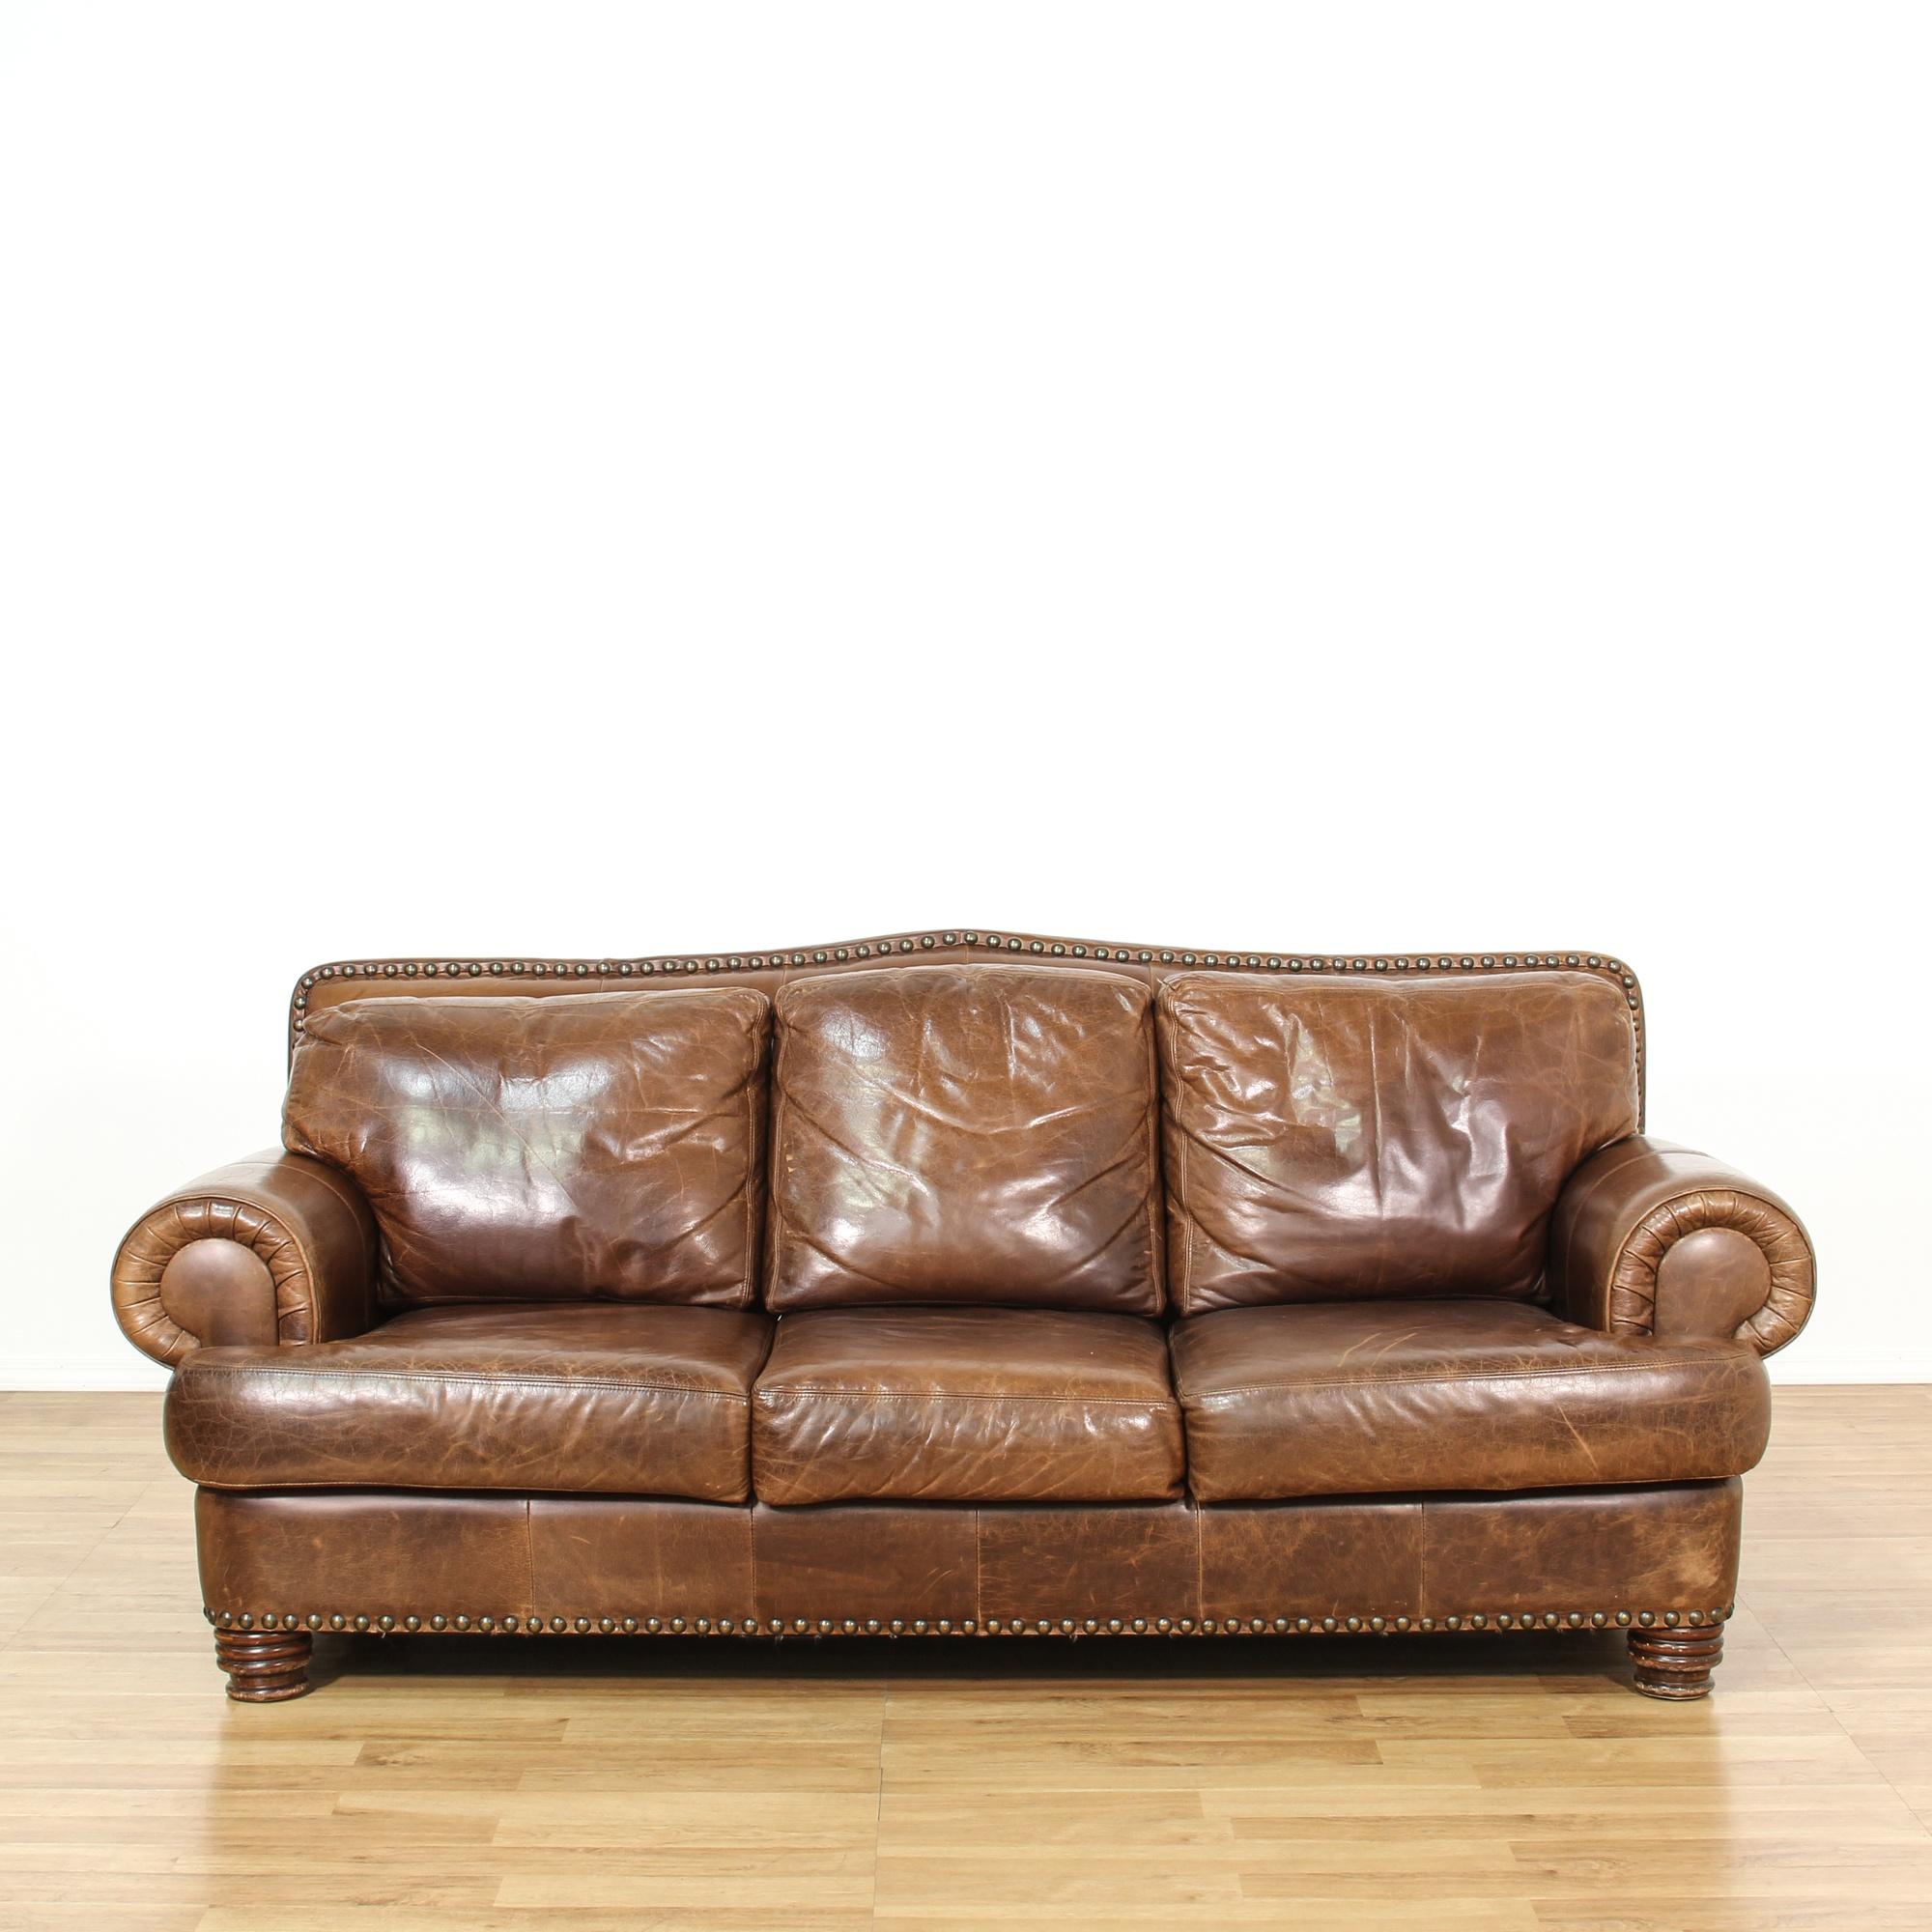 ralph style leather studded sofa loveseat vintage